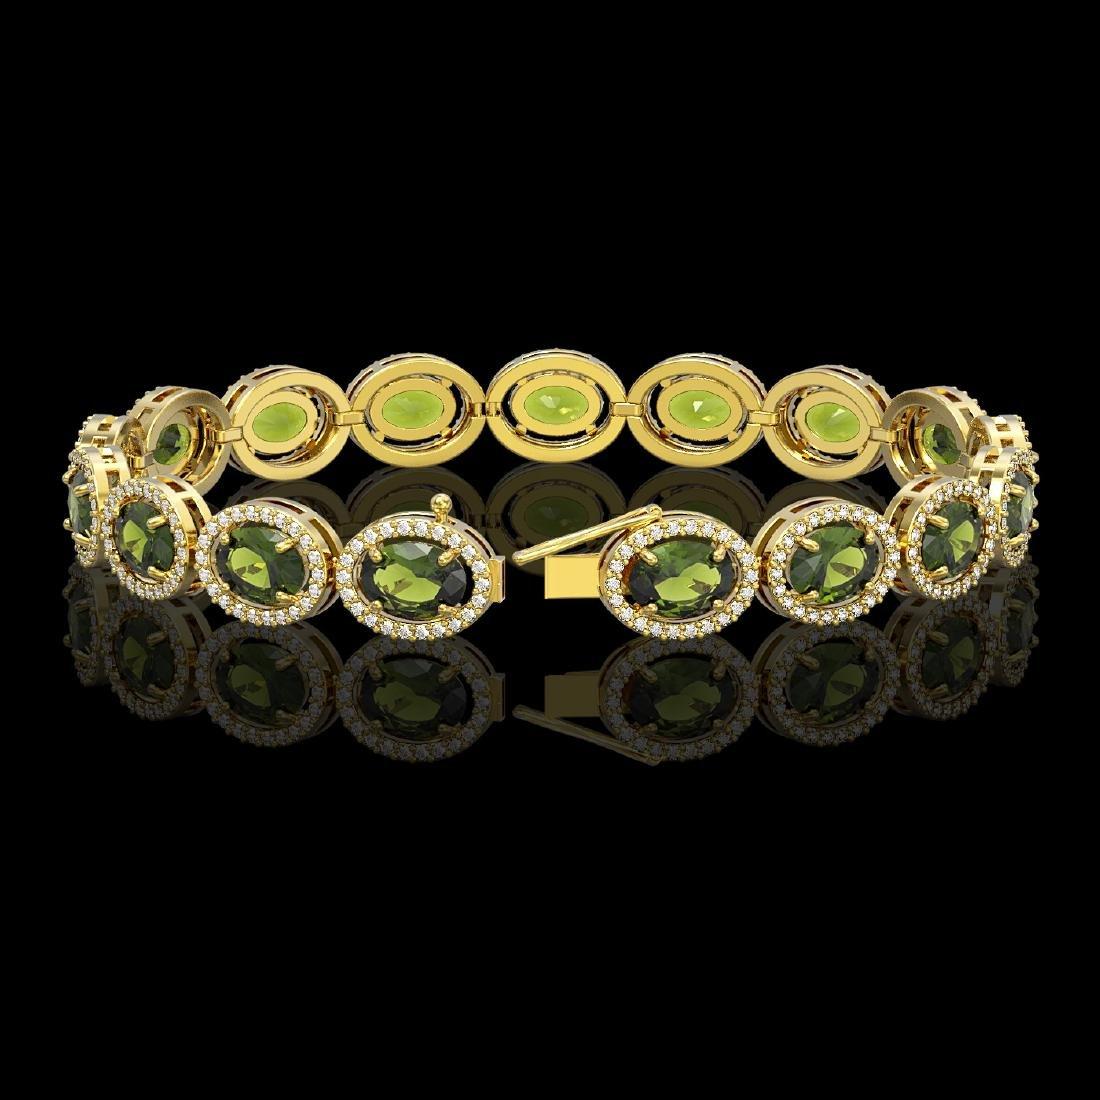 21.71 CTW Tourmaline & Diamond Halo Bracelet 10K Yellow - 2